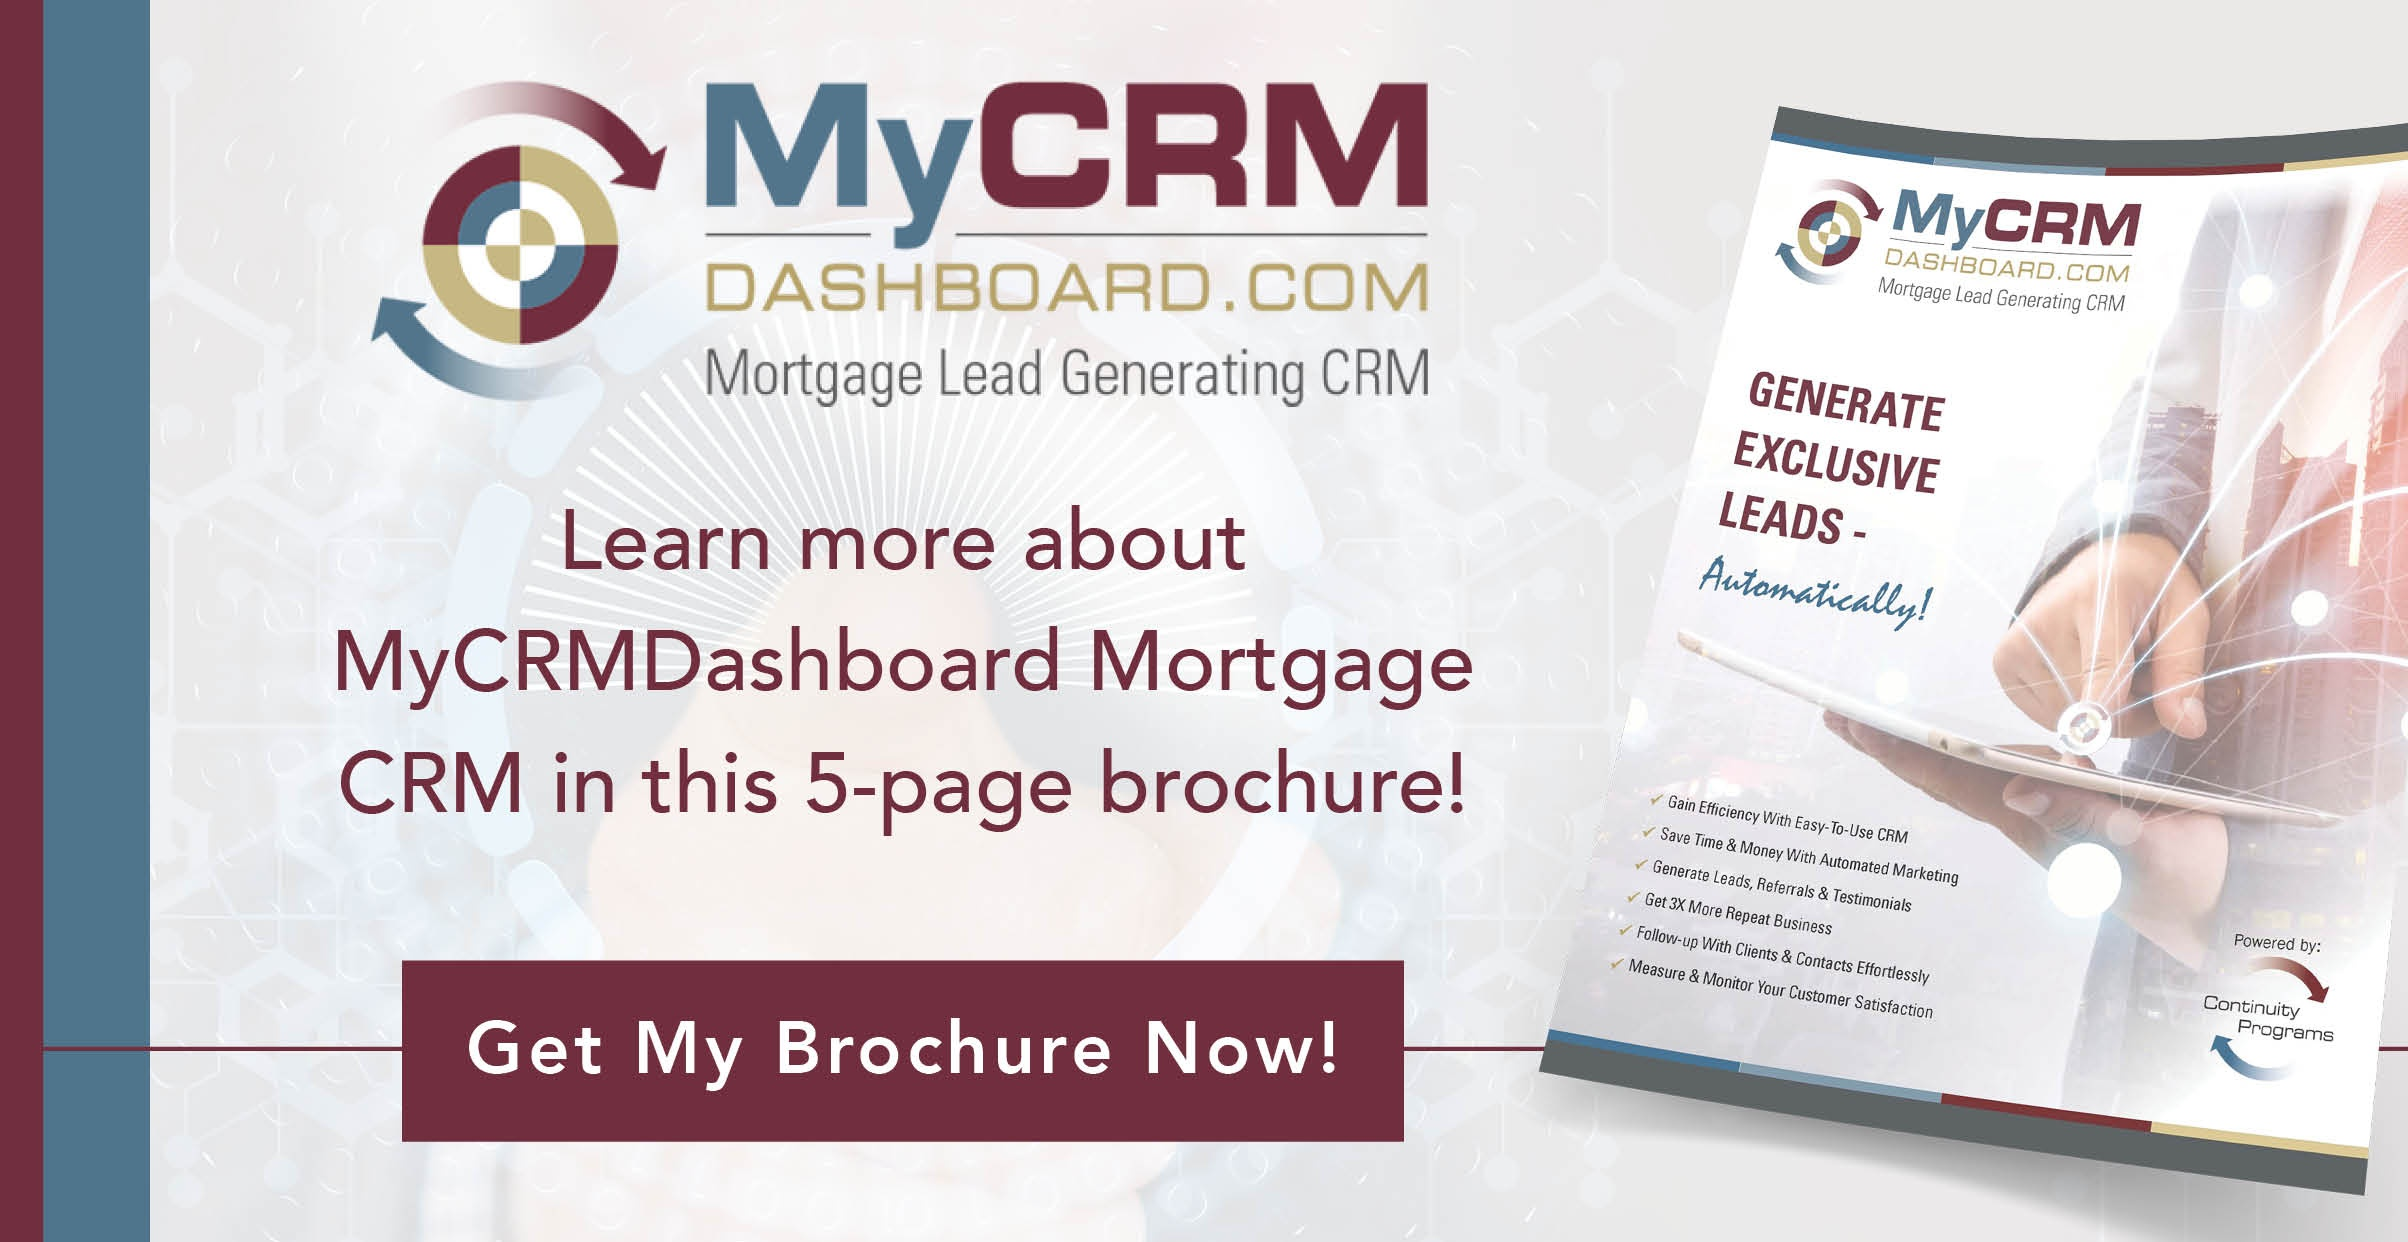 MyCRMDashboard Brochure